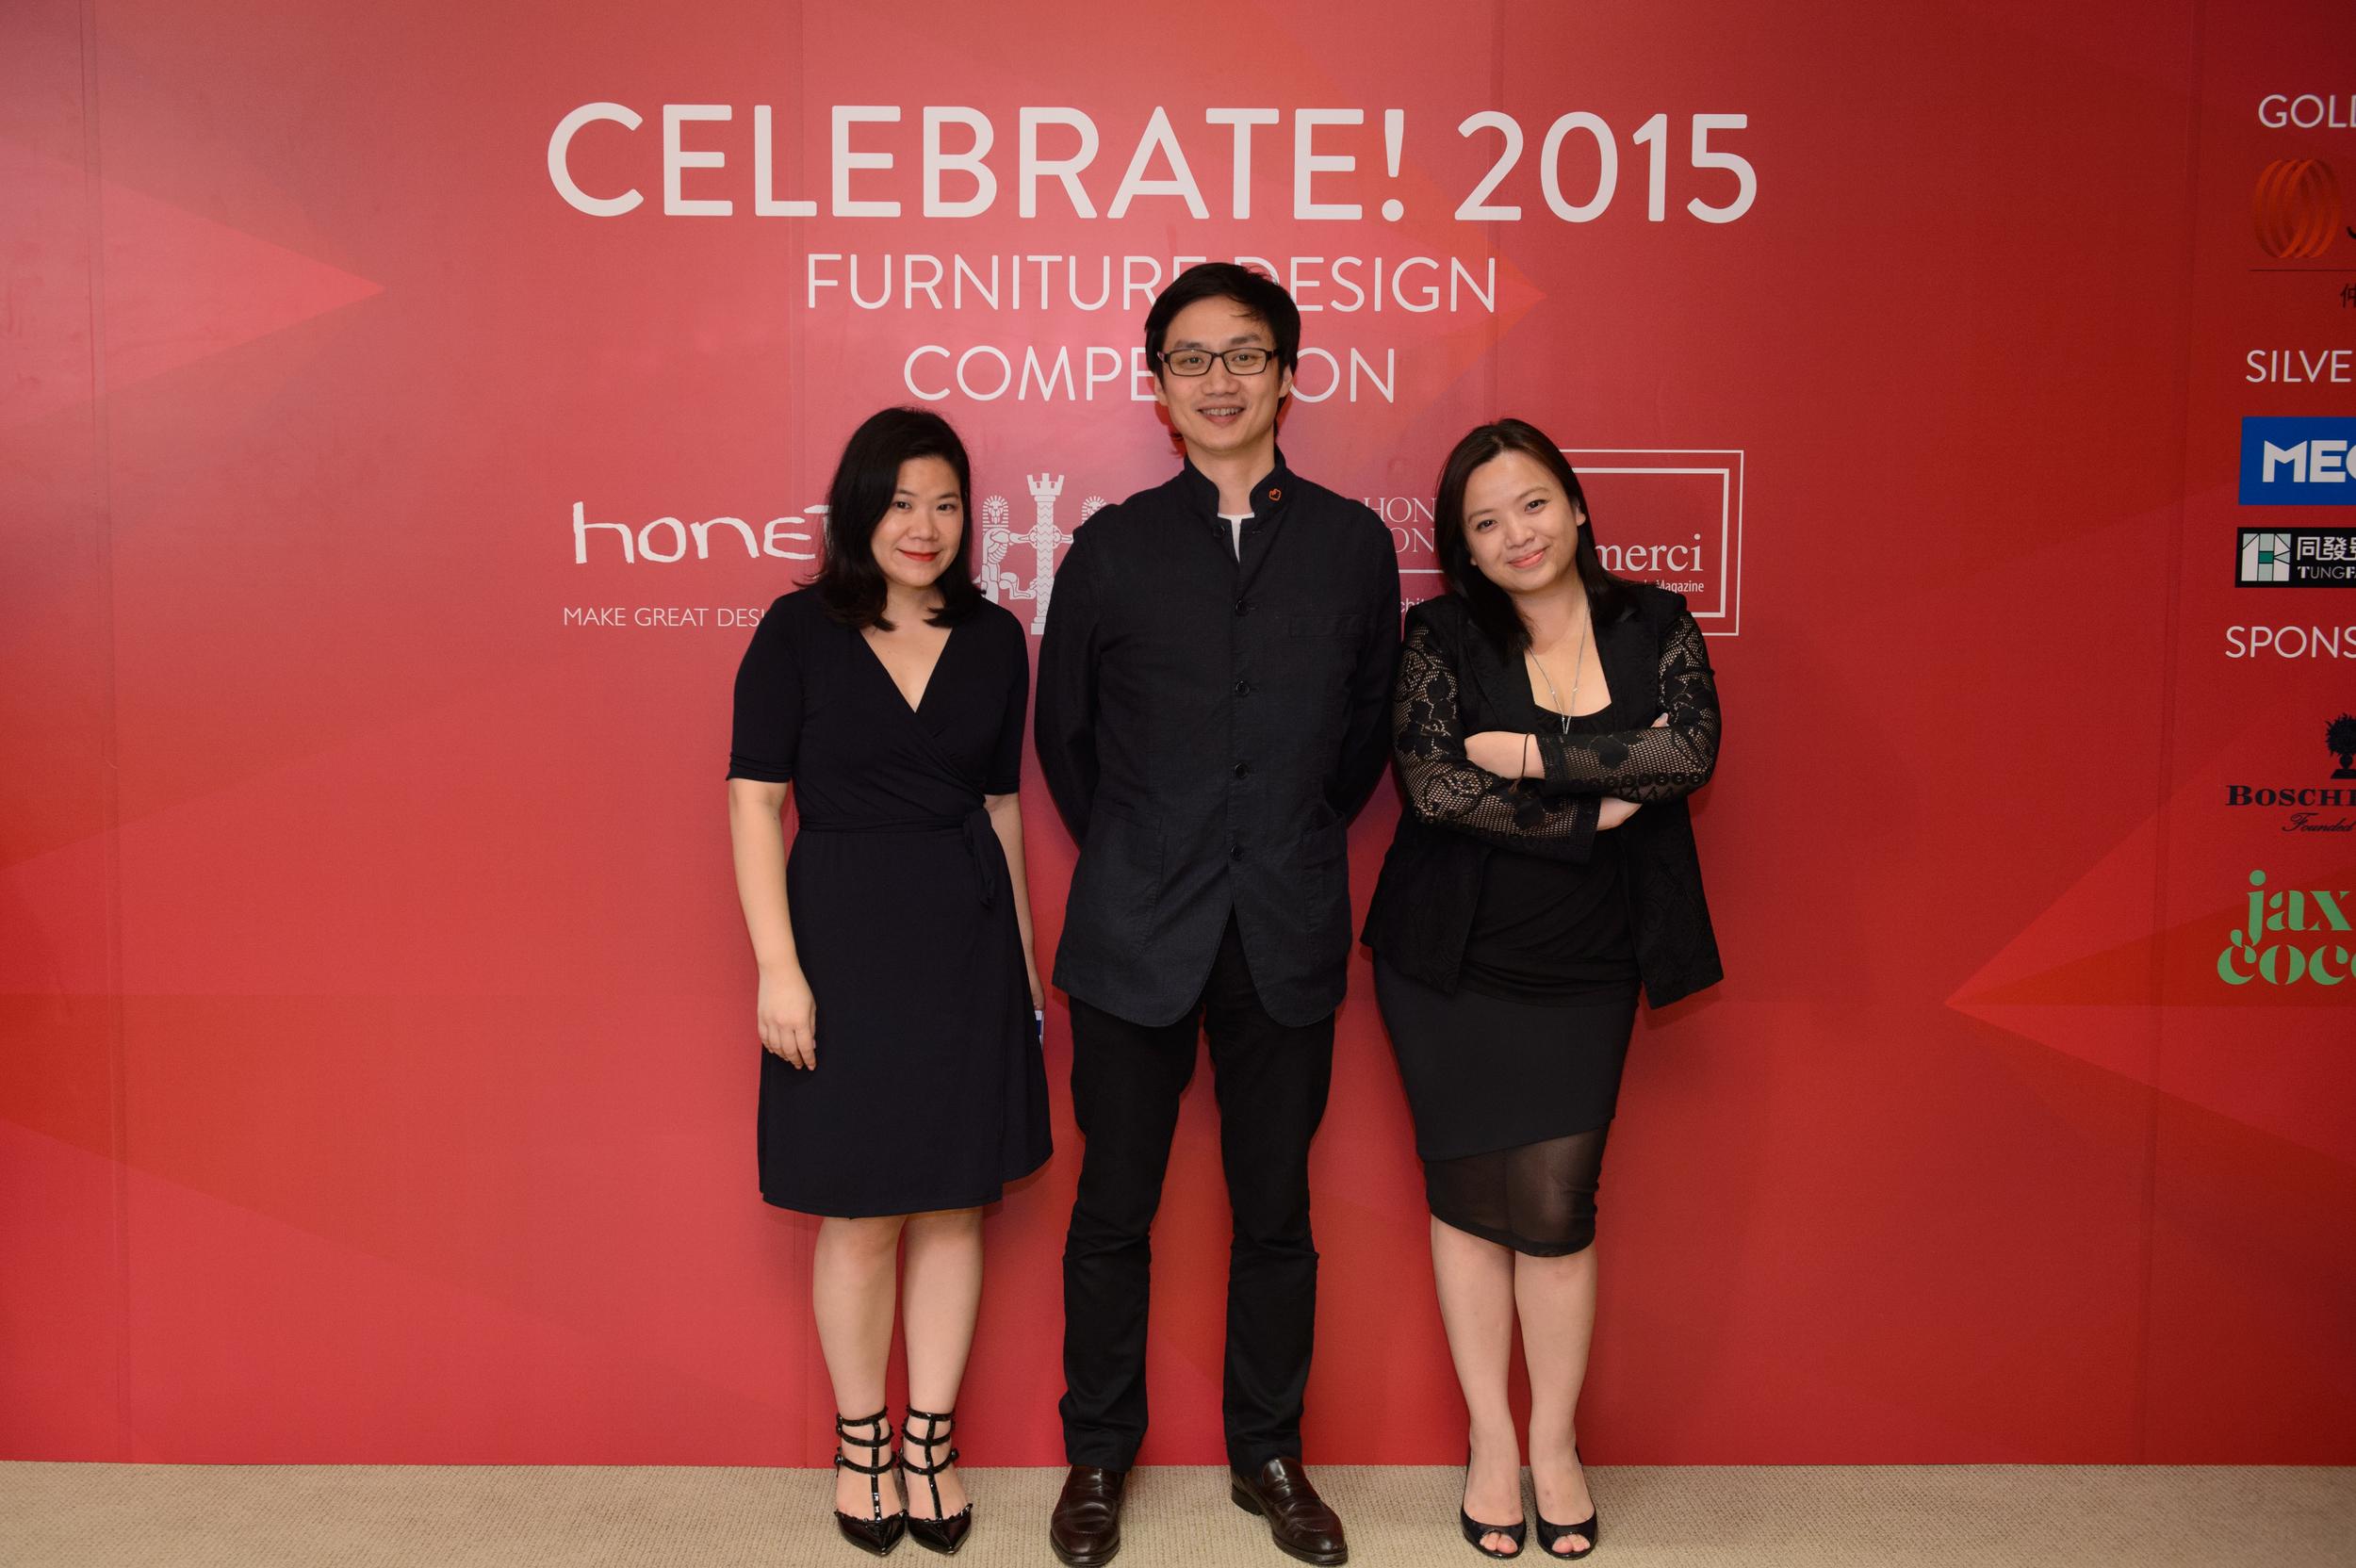 Curators & Project Teams of Celebrate! 2015